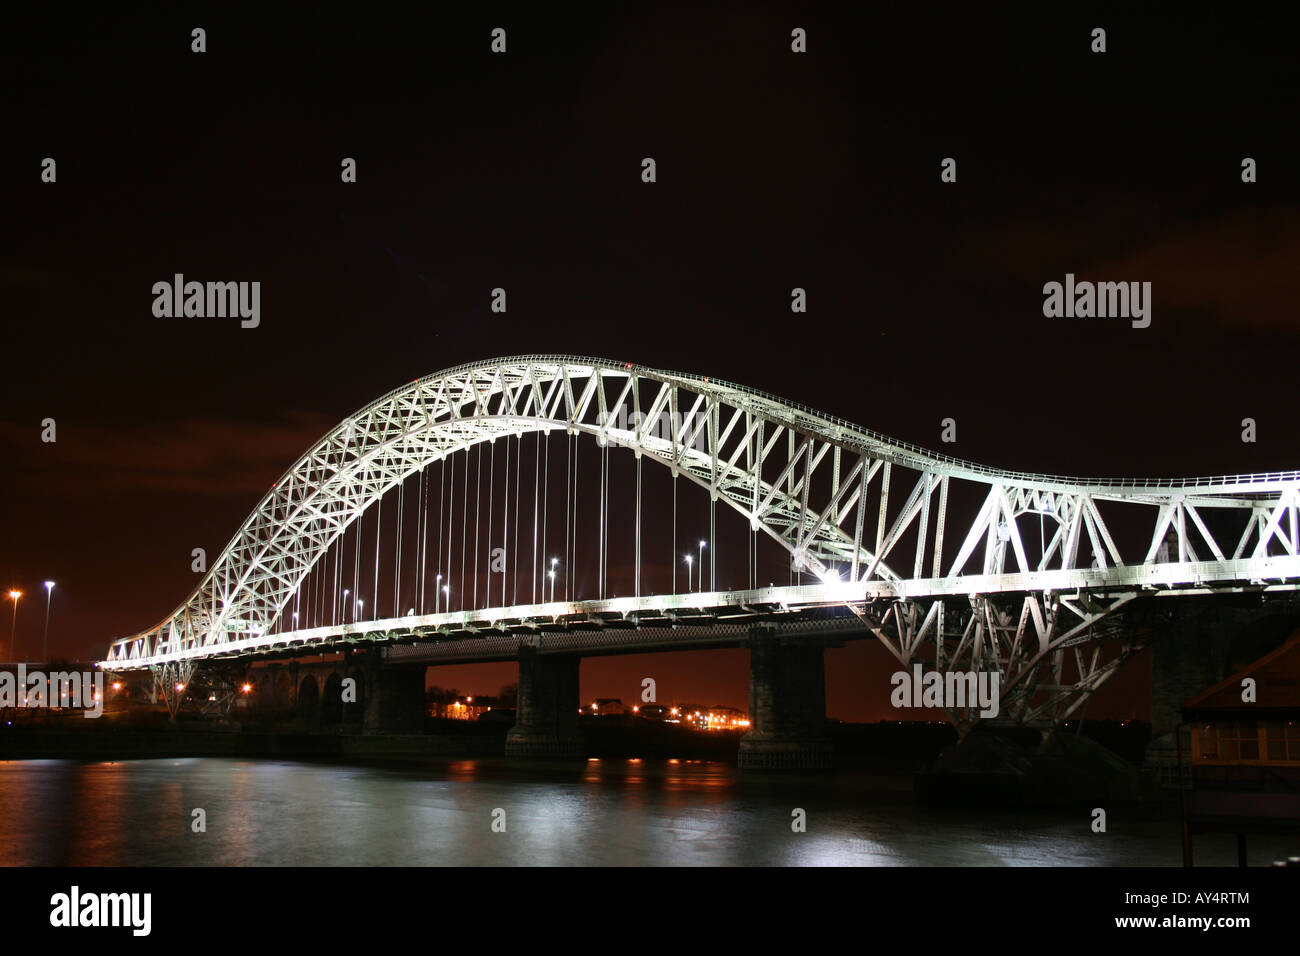 Runcorn Bridge (Silver Jubilee Suspension Bridge) at Night  [A533 Queensway, Runcorn/Widnes, Cheshire, England, - Stock Image